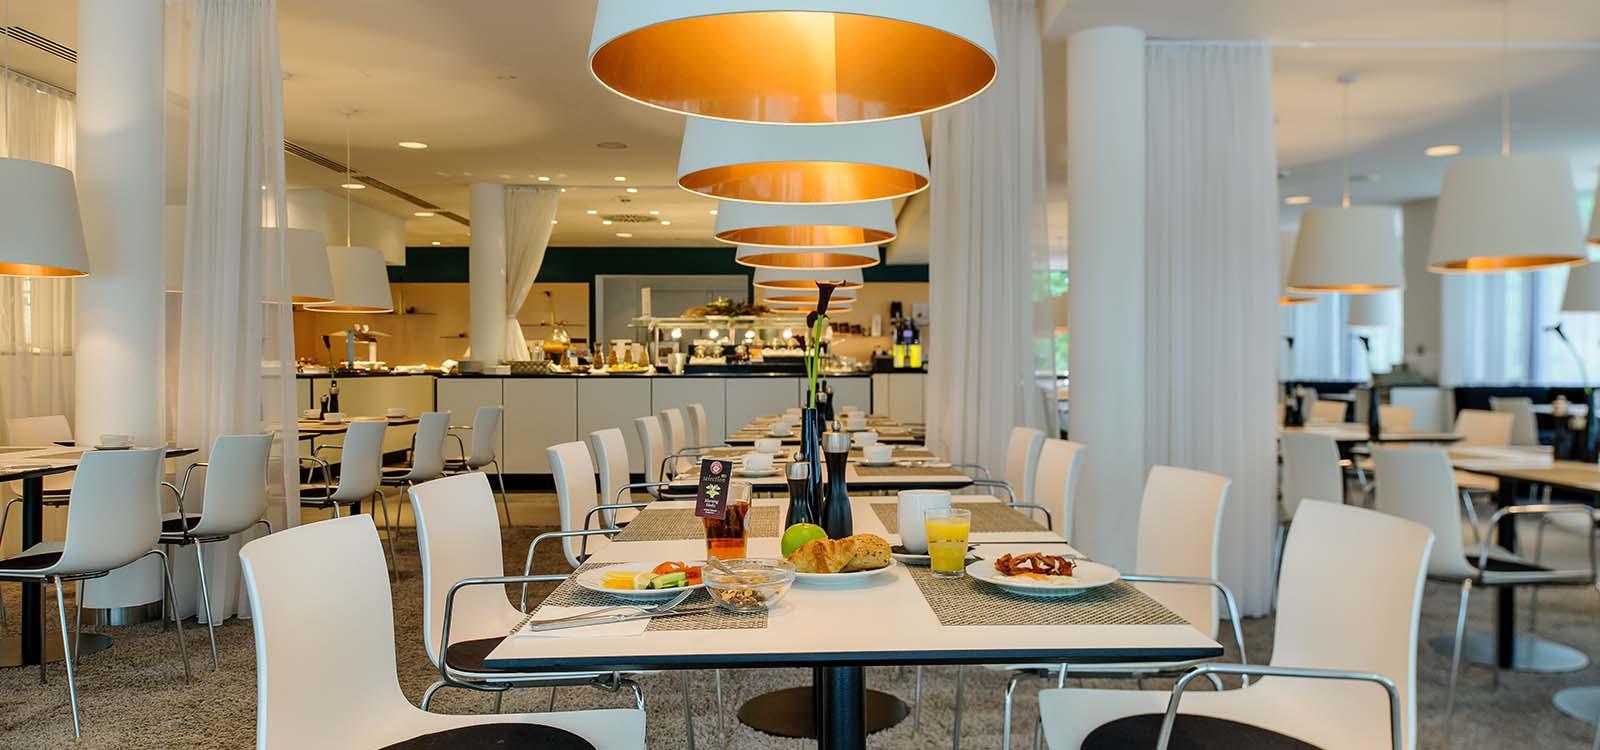 restaurant mercure n rnberg an der messe event hotels intl markenhotellerie in deutschland. Black Bedroom Furniture Sets. Home Design Ideas